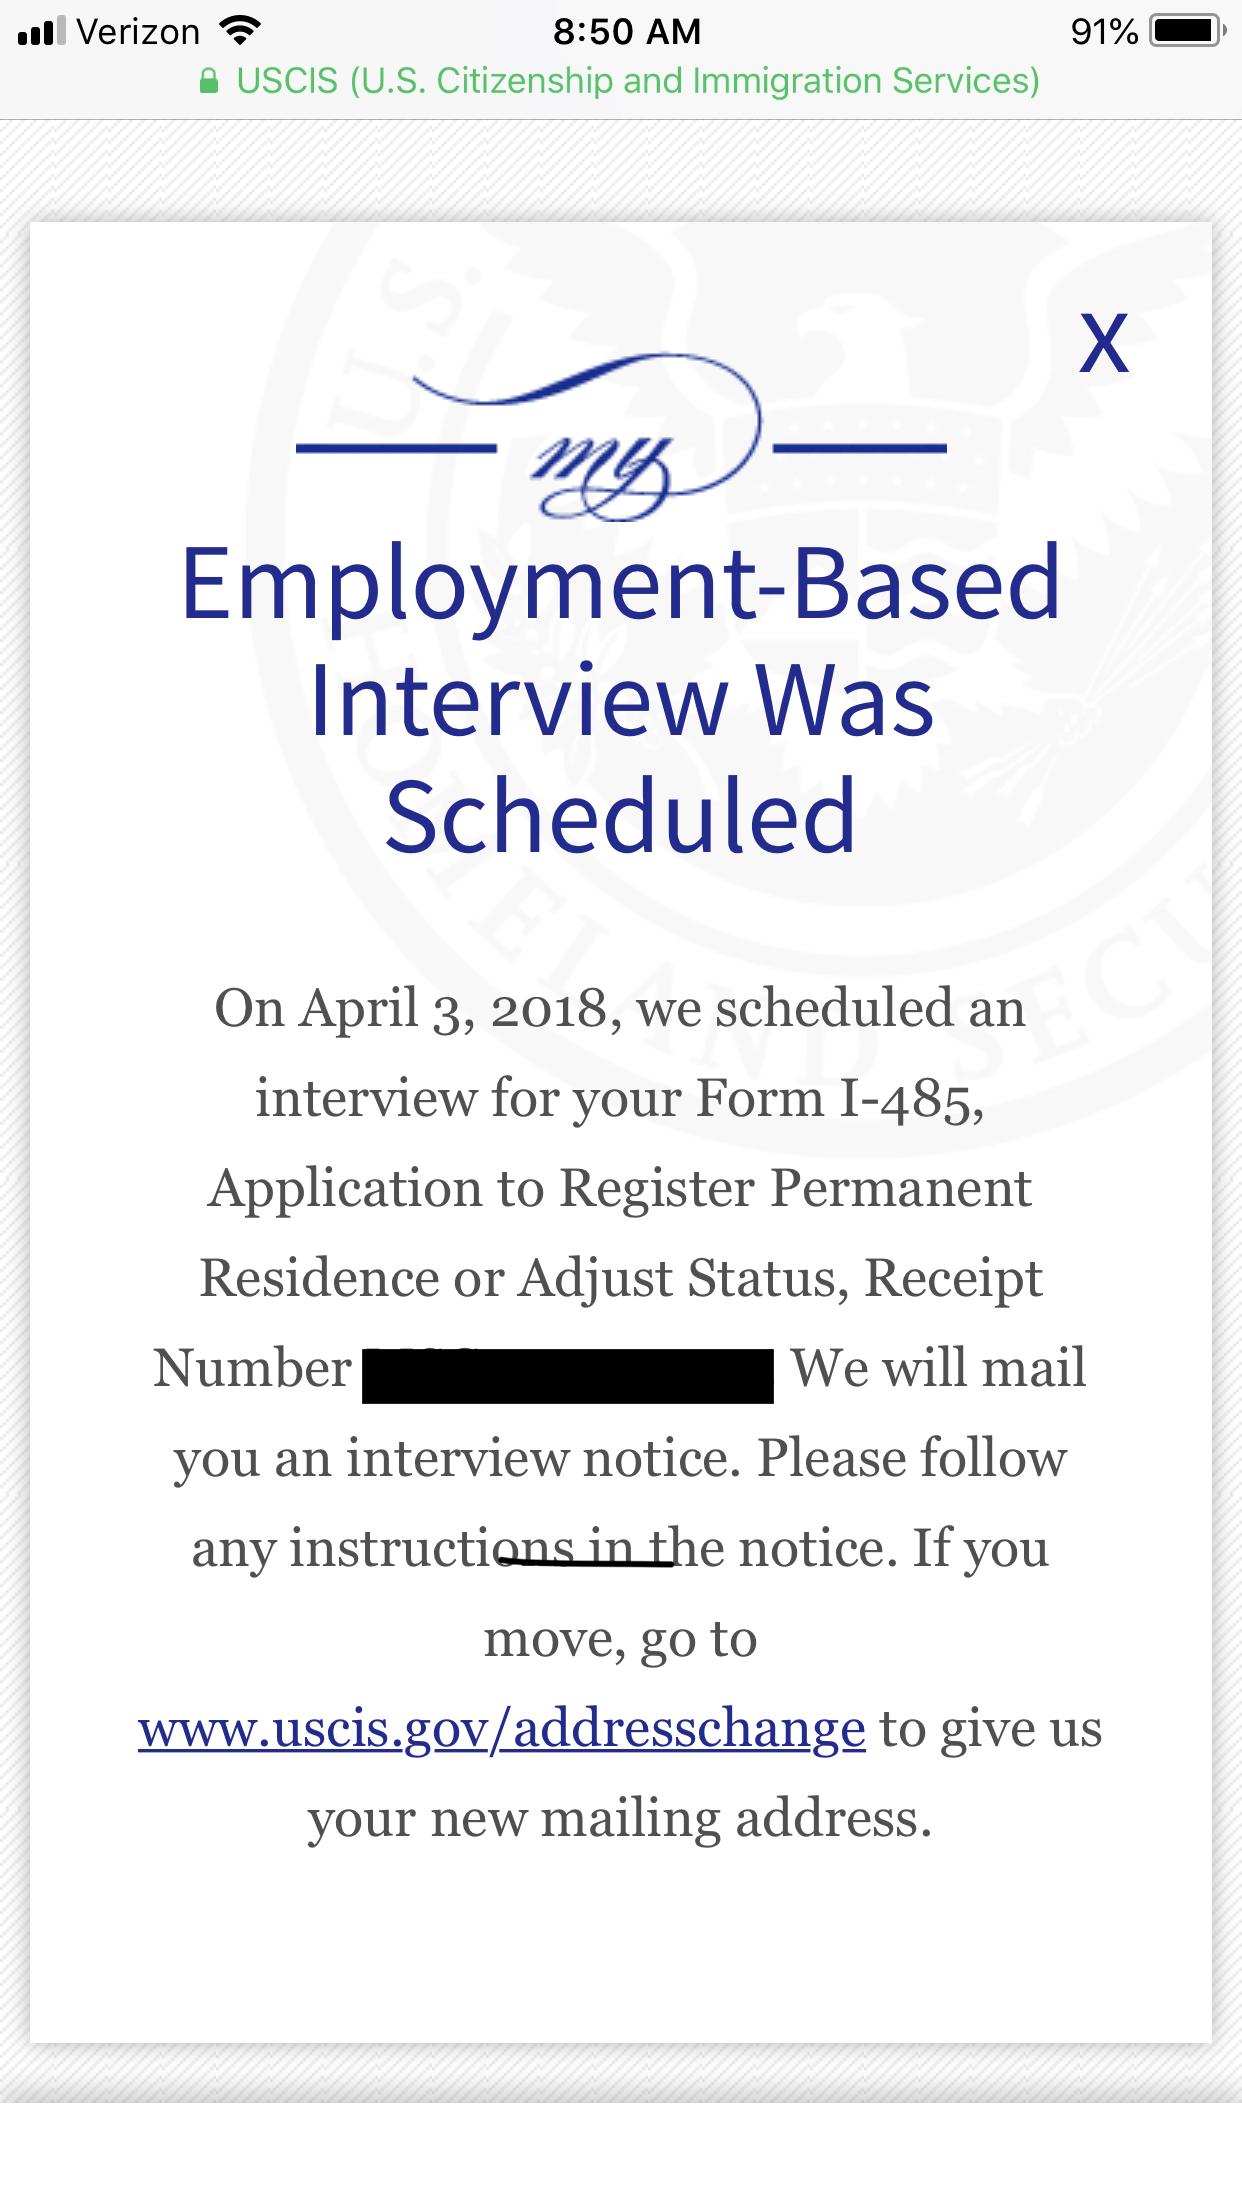 Uscis Interview In Fairfax Va